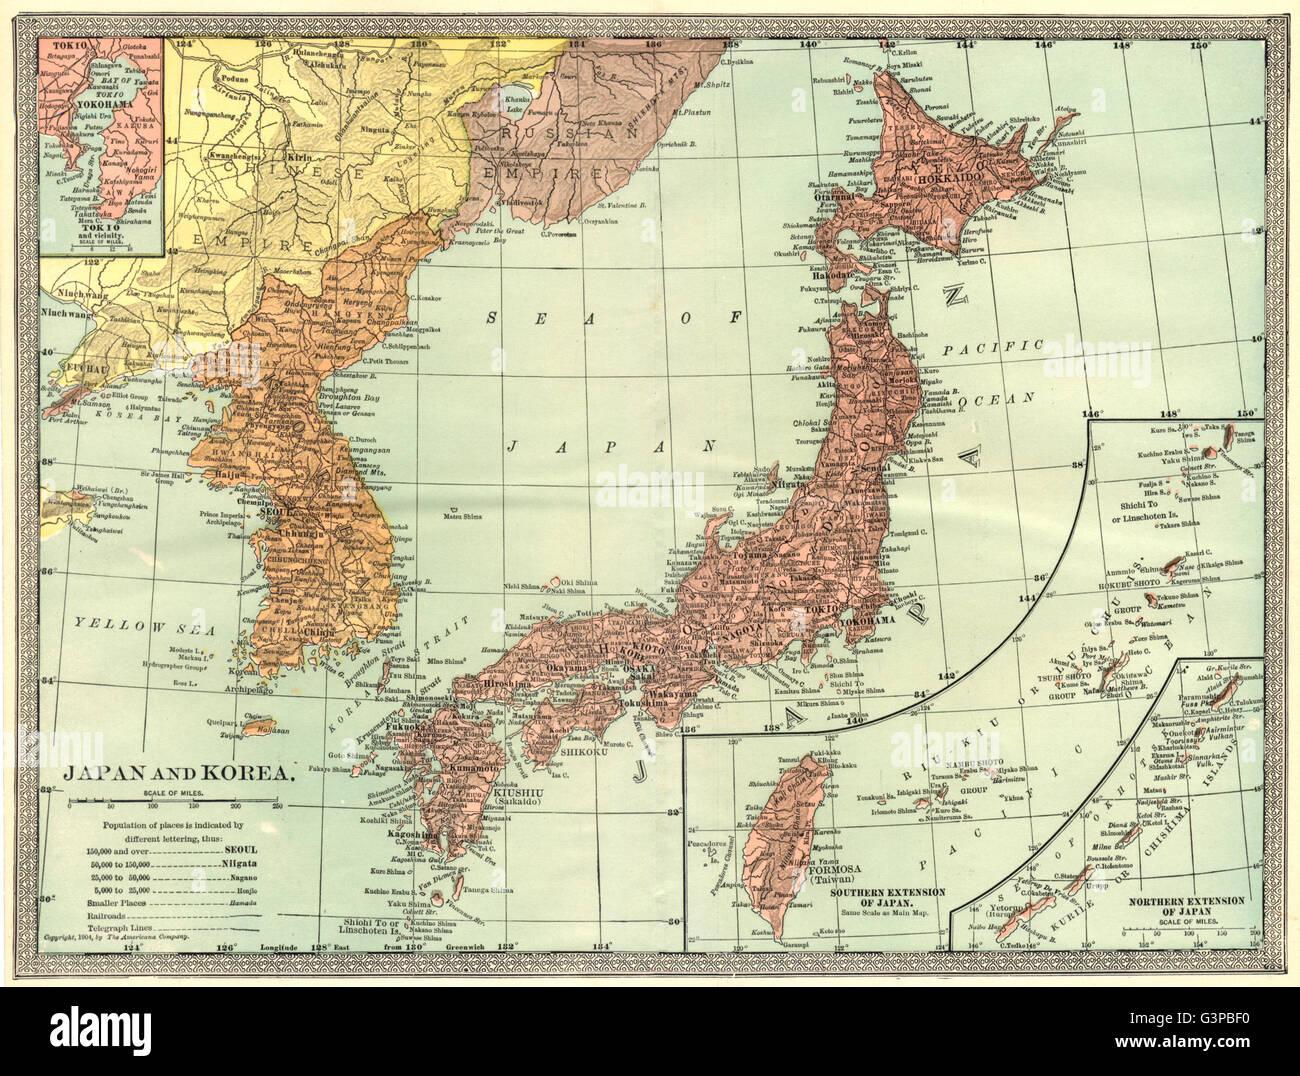 Japan korea formosataiwan inset tokyo bay yokohama 1907 japan korea formosataiwan inset tokyo bay yokohama 1907 antique map gumiabroncs Images